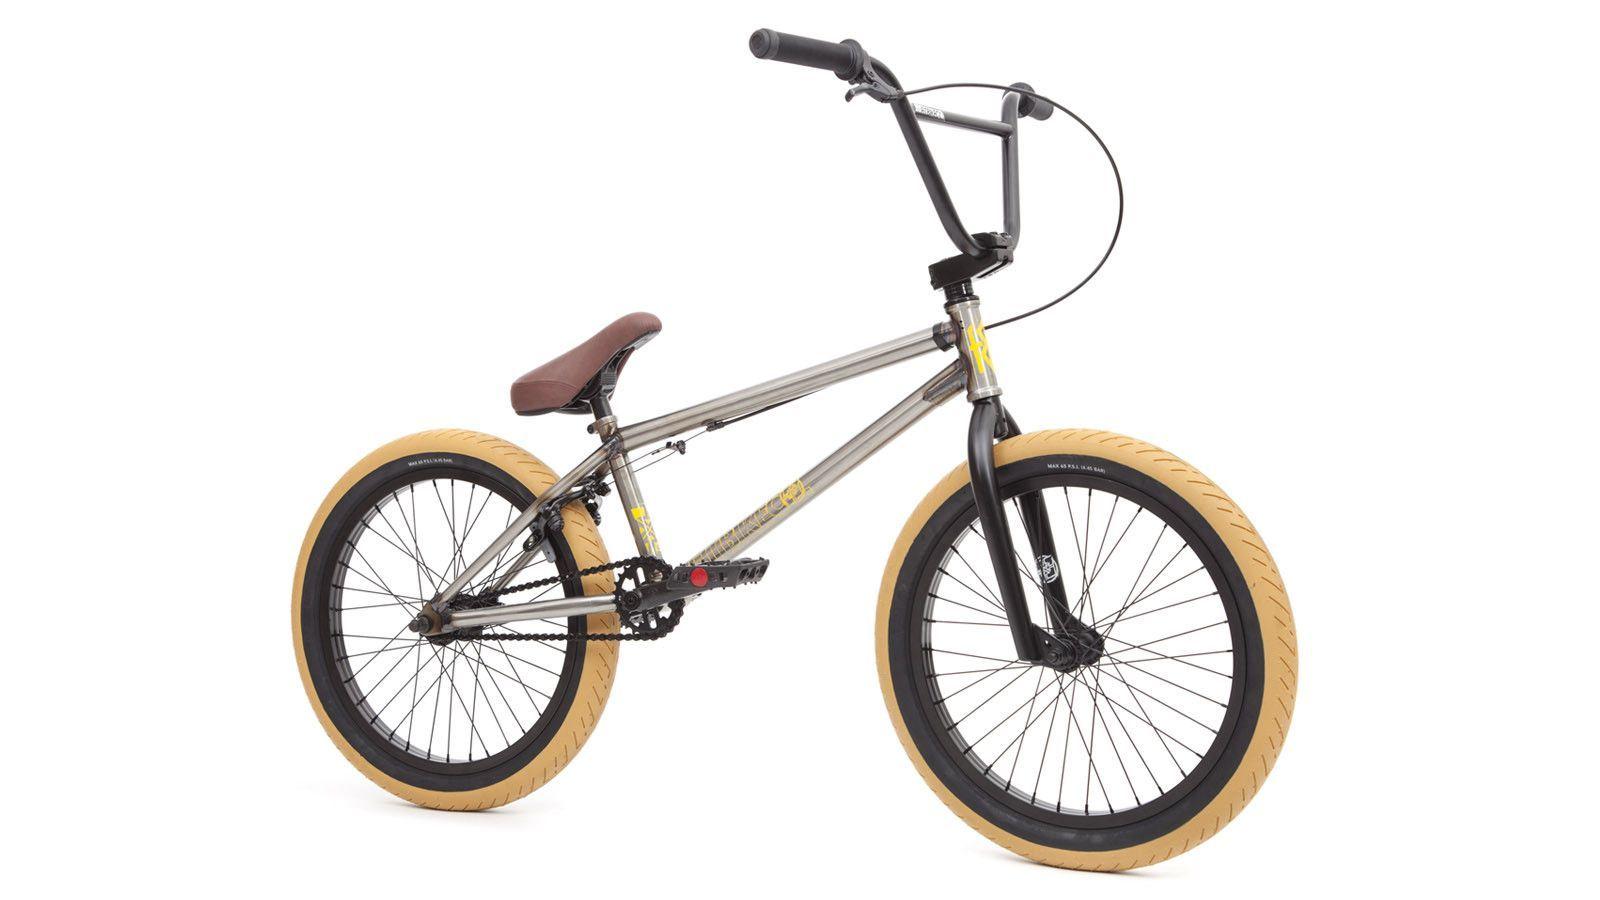 2016 Fit Conway 1 Complete Bmx Bike Clear Raw Bmx bikes